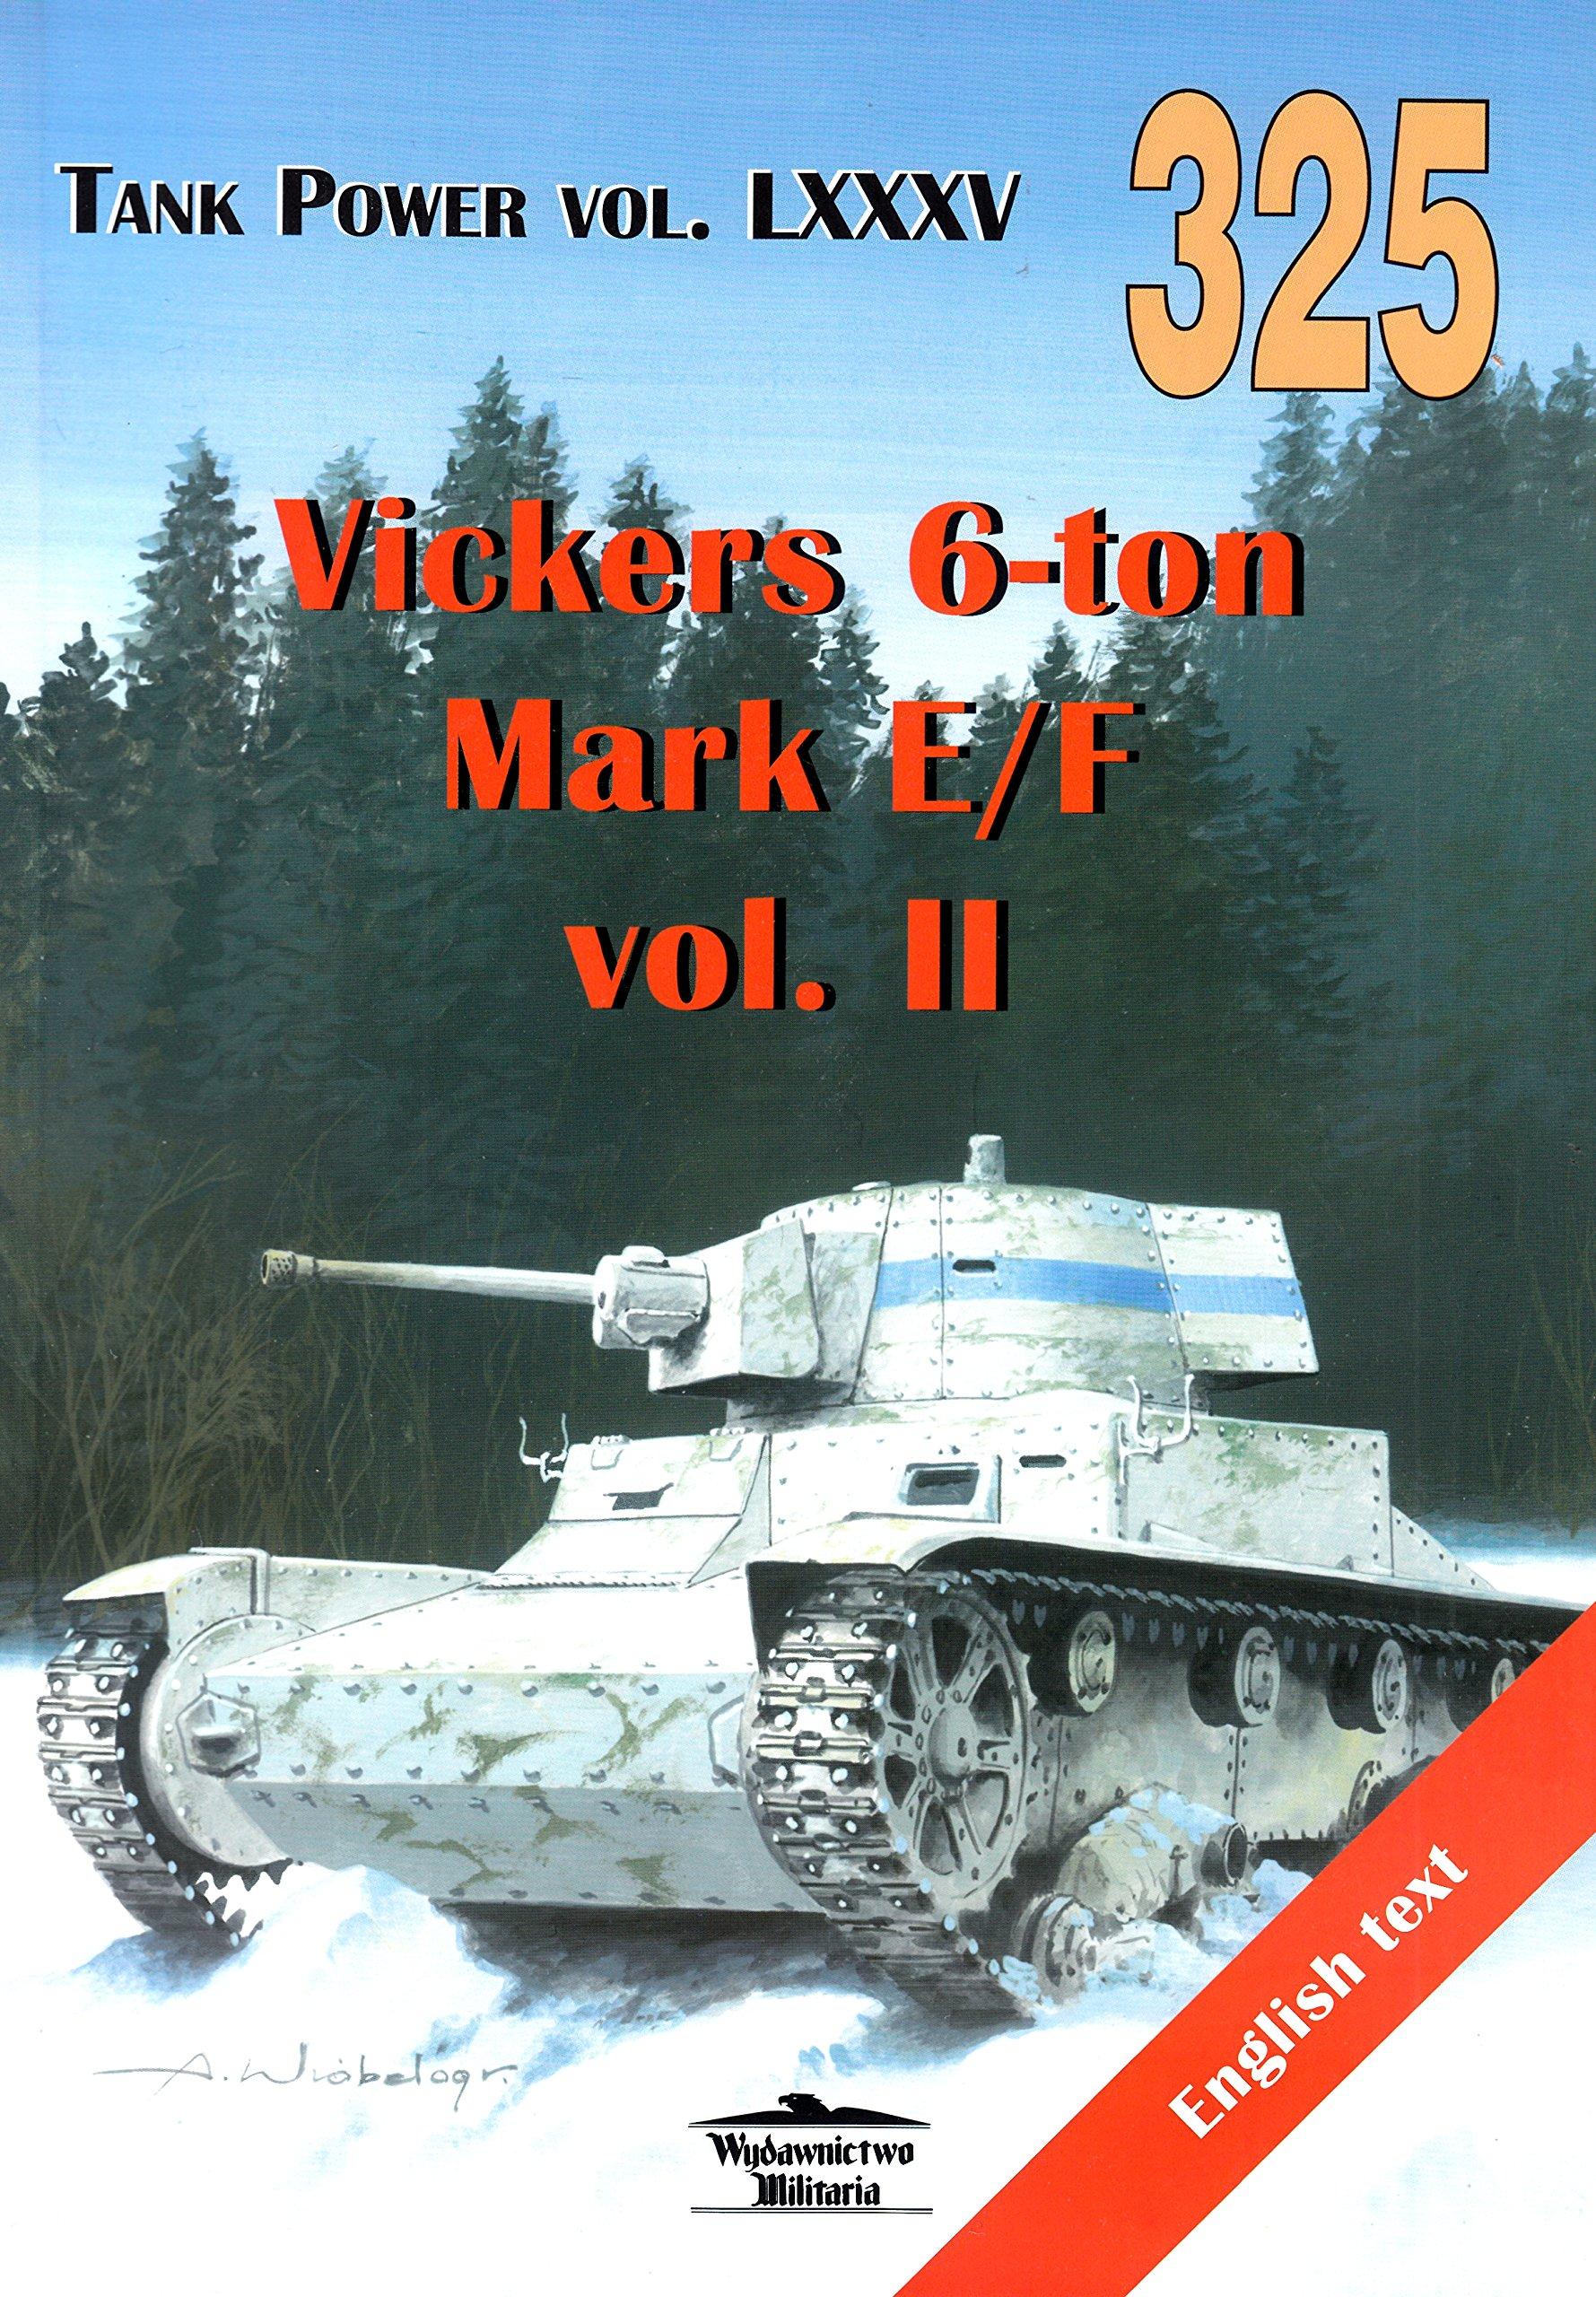 Read Online No. 325 -Vickers 6-ton Mark E/F Volume II - Tank Power Vol. LXXXV ebook